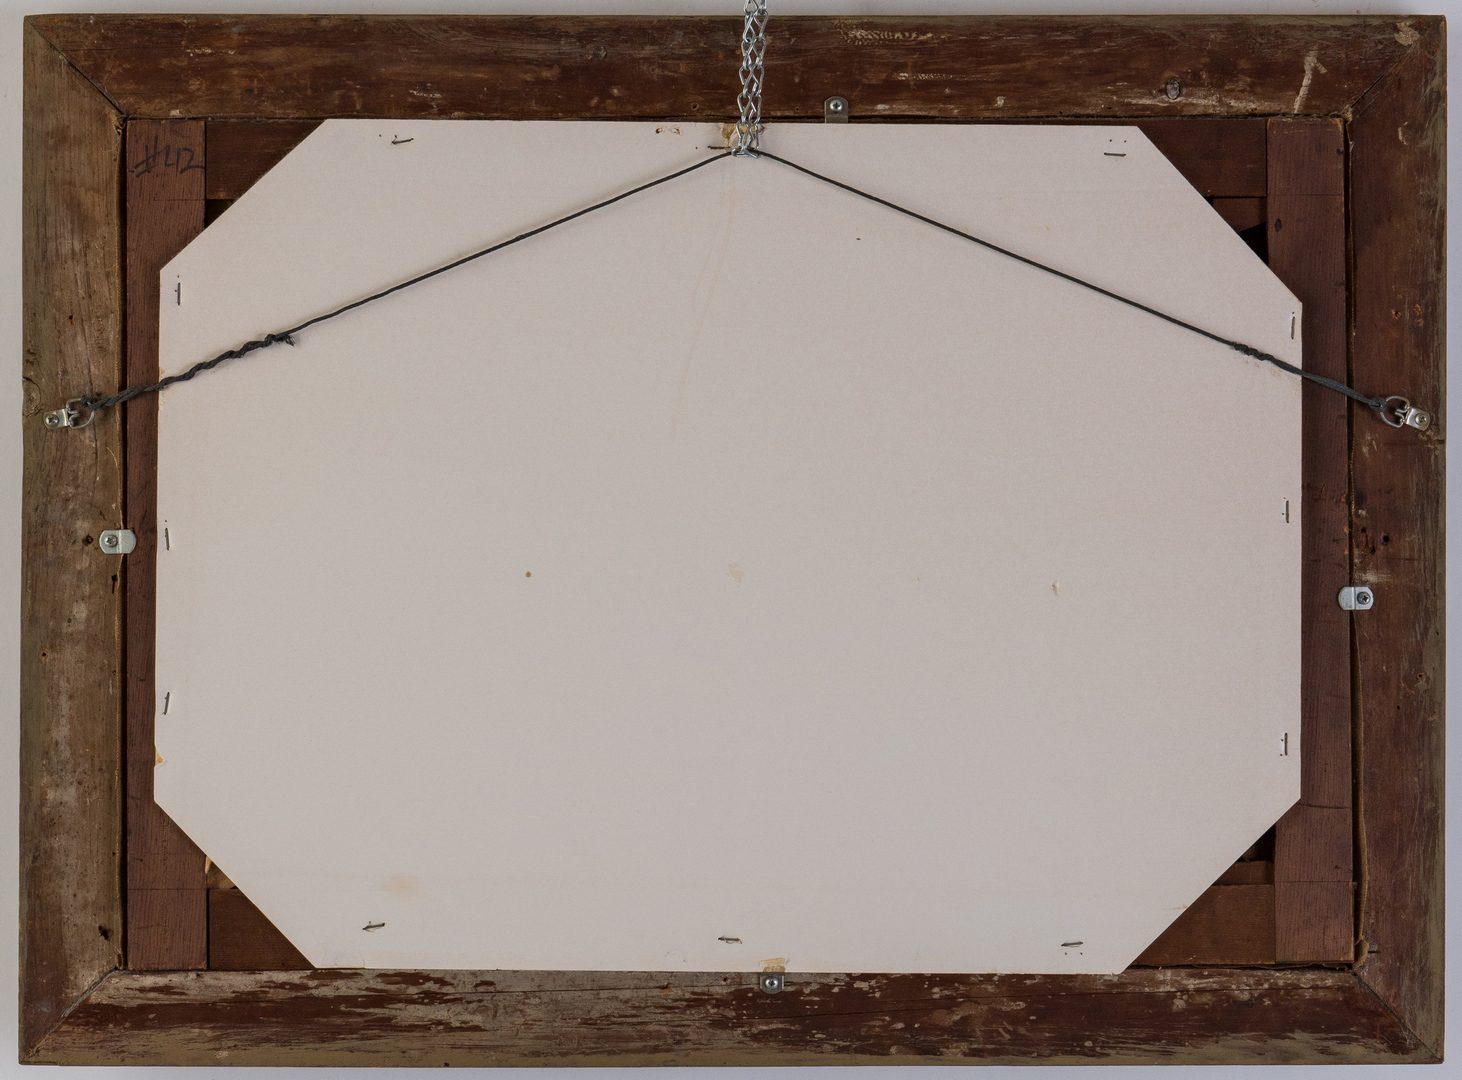 Lot 102: American or British School O/C Fly Fishing Scene, Signed